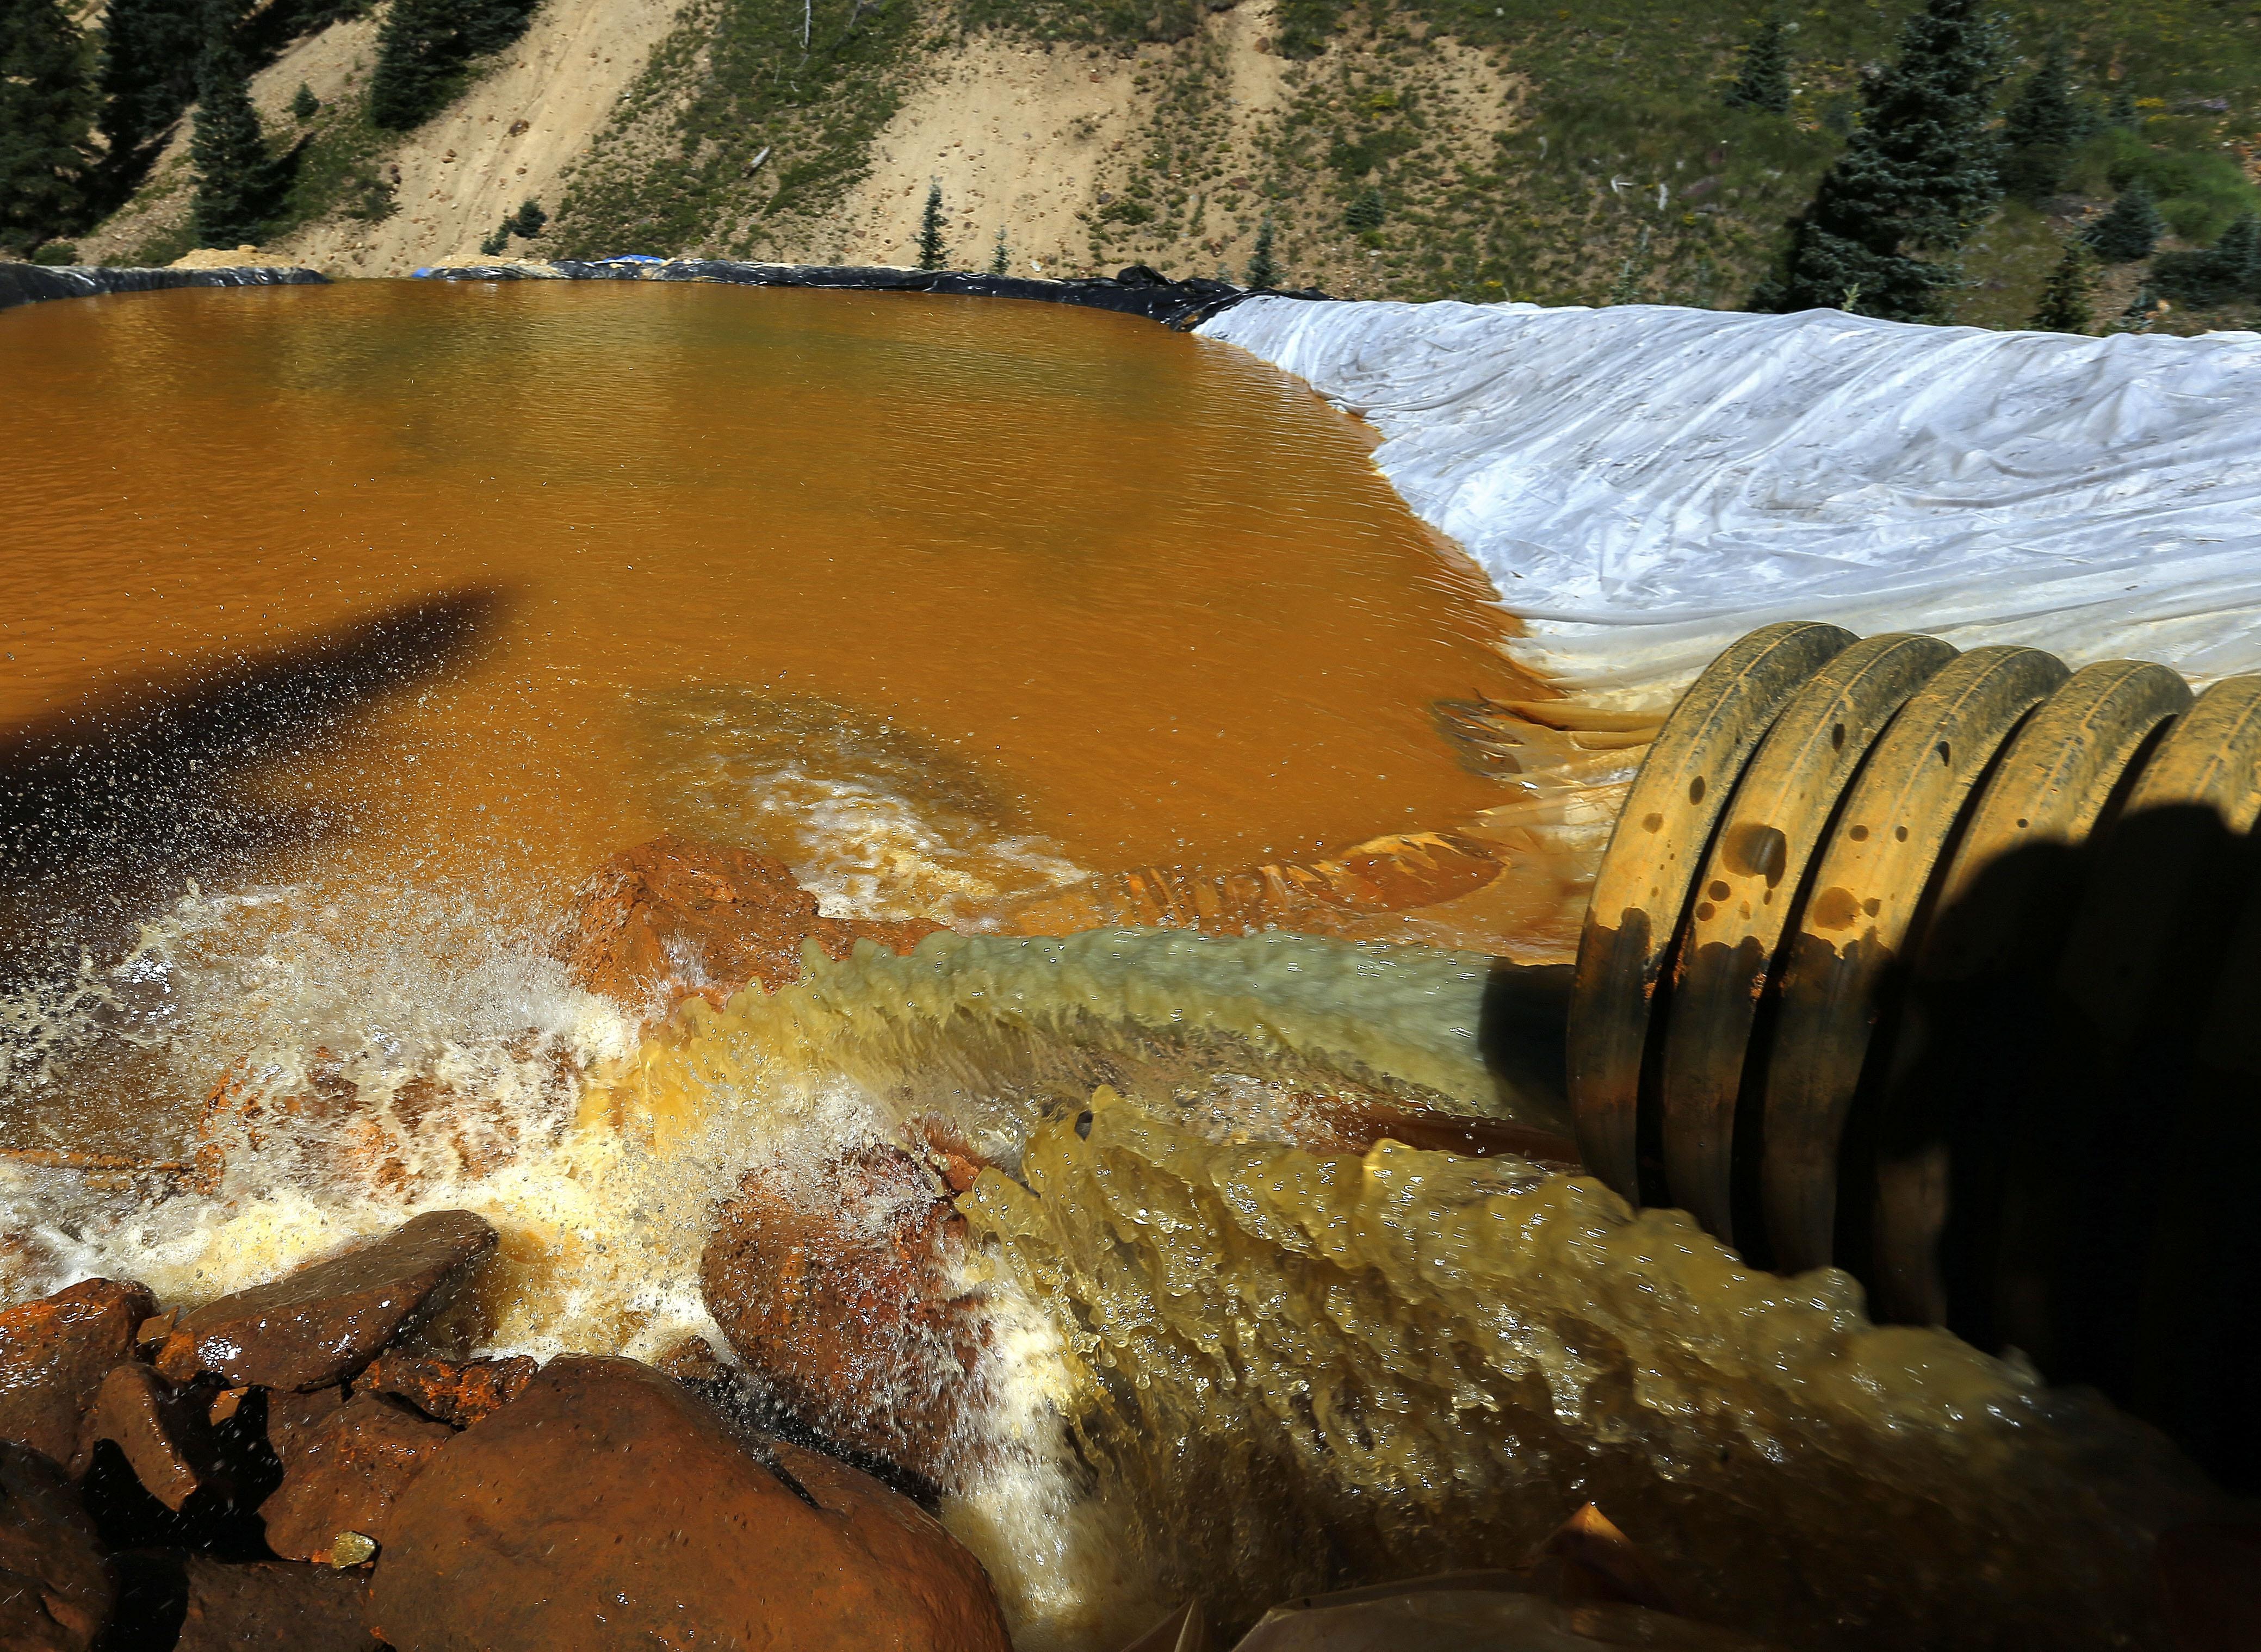 Work Crews Returning To Site Of Massive Colorado Mine Spill